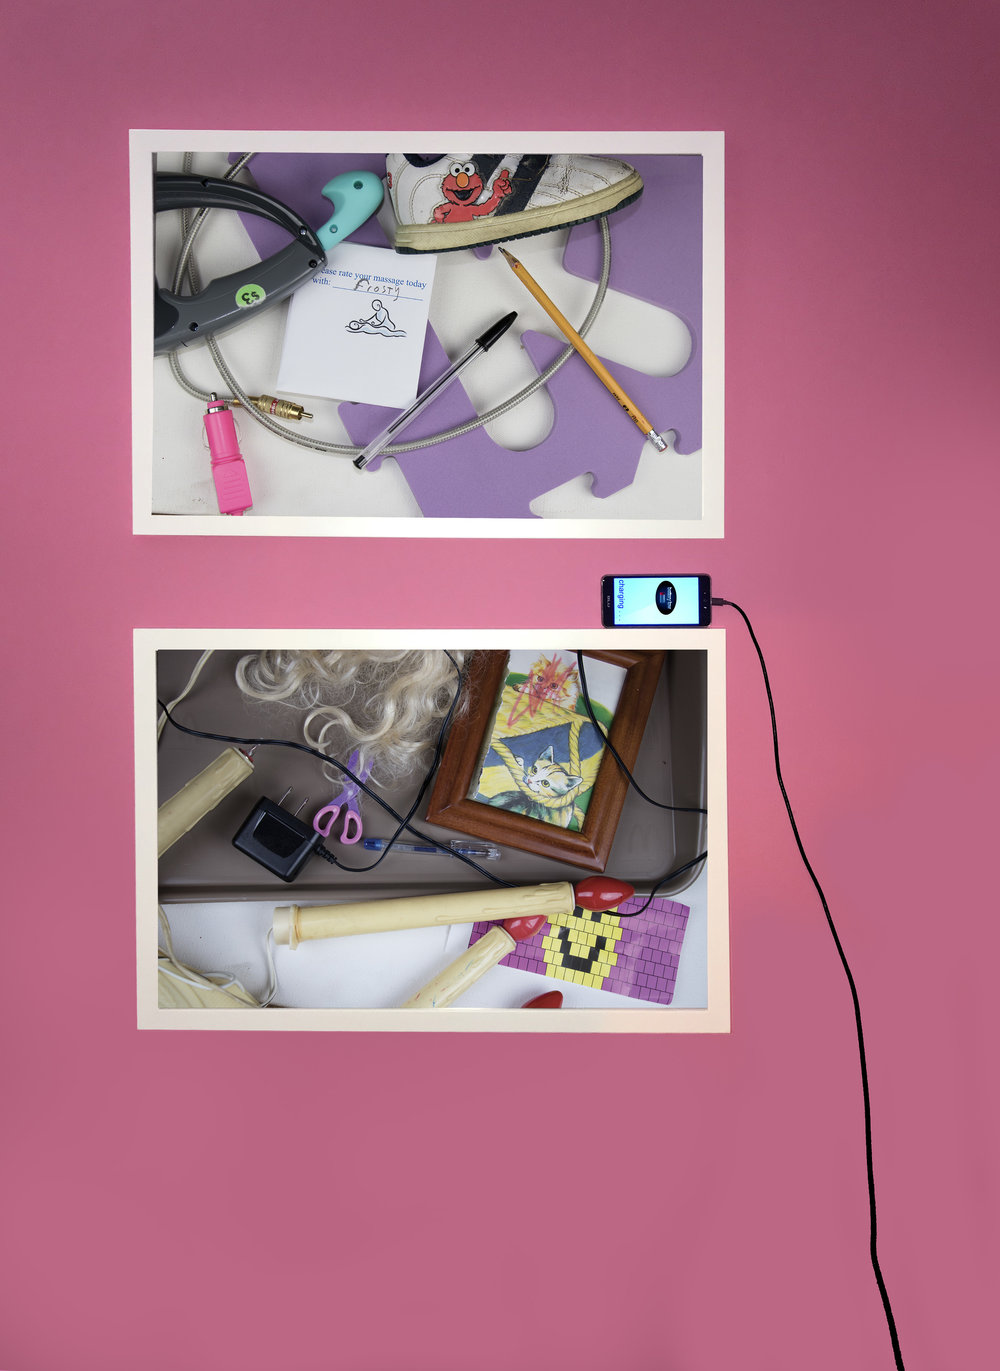 ciocci_2019_pink_wall.jpg